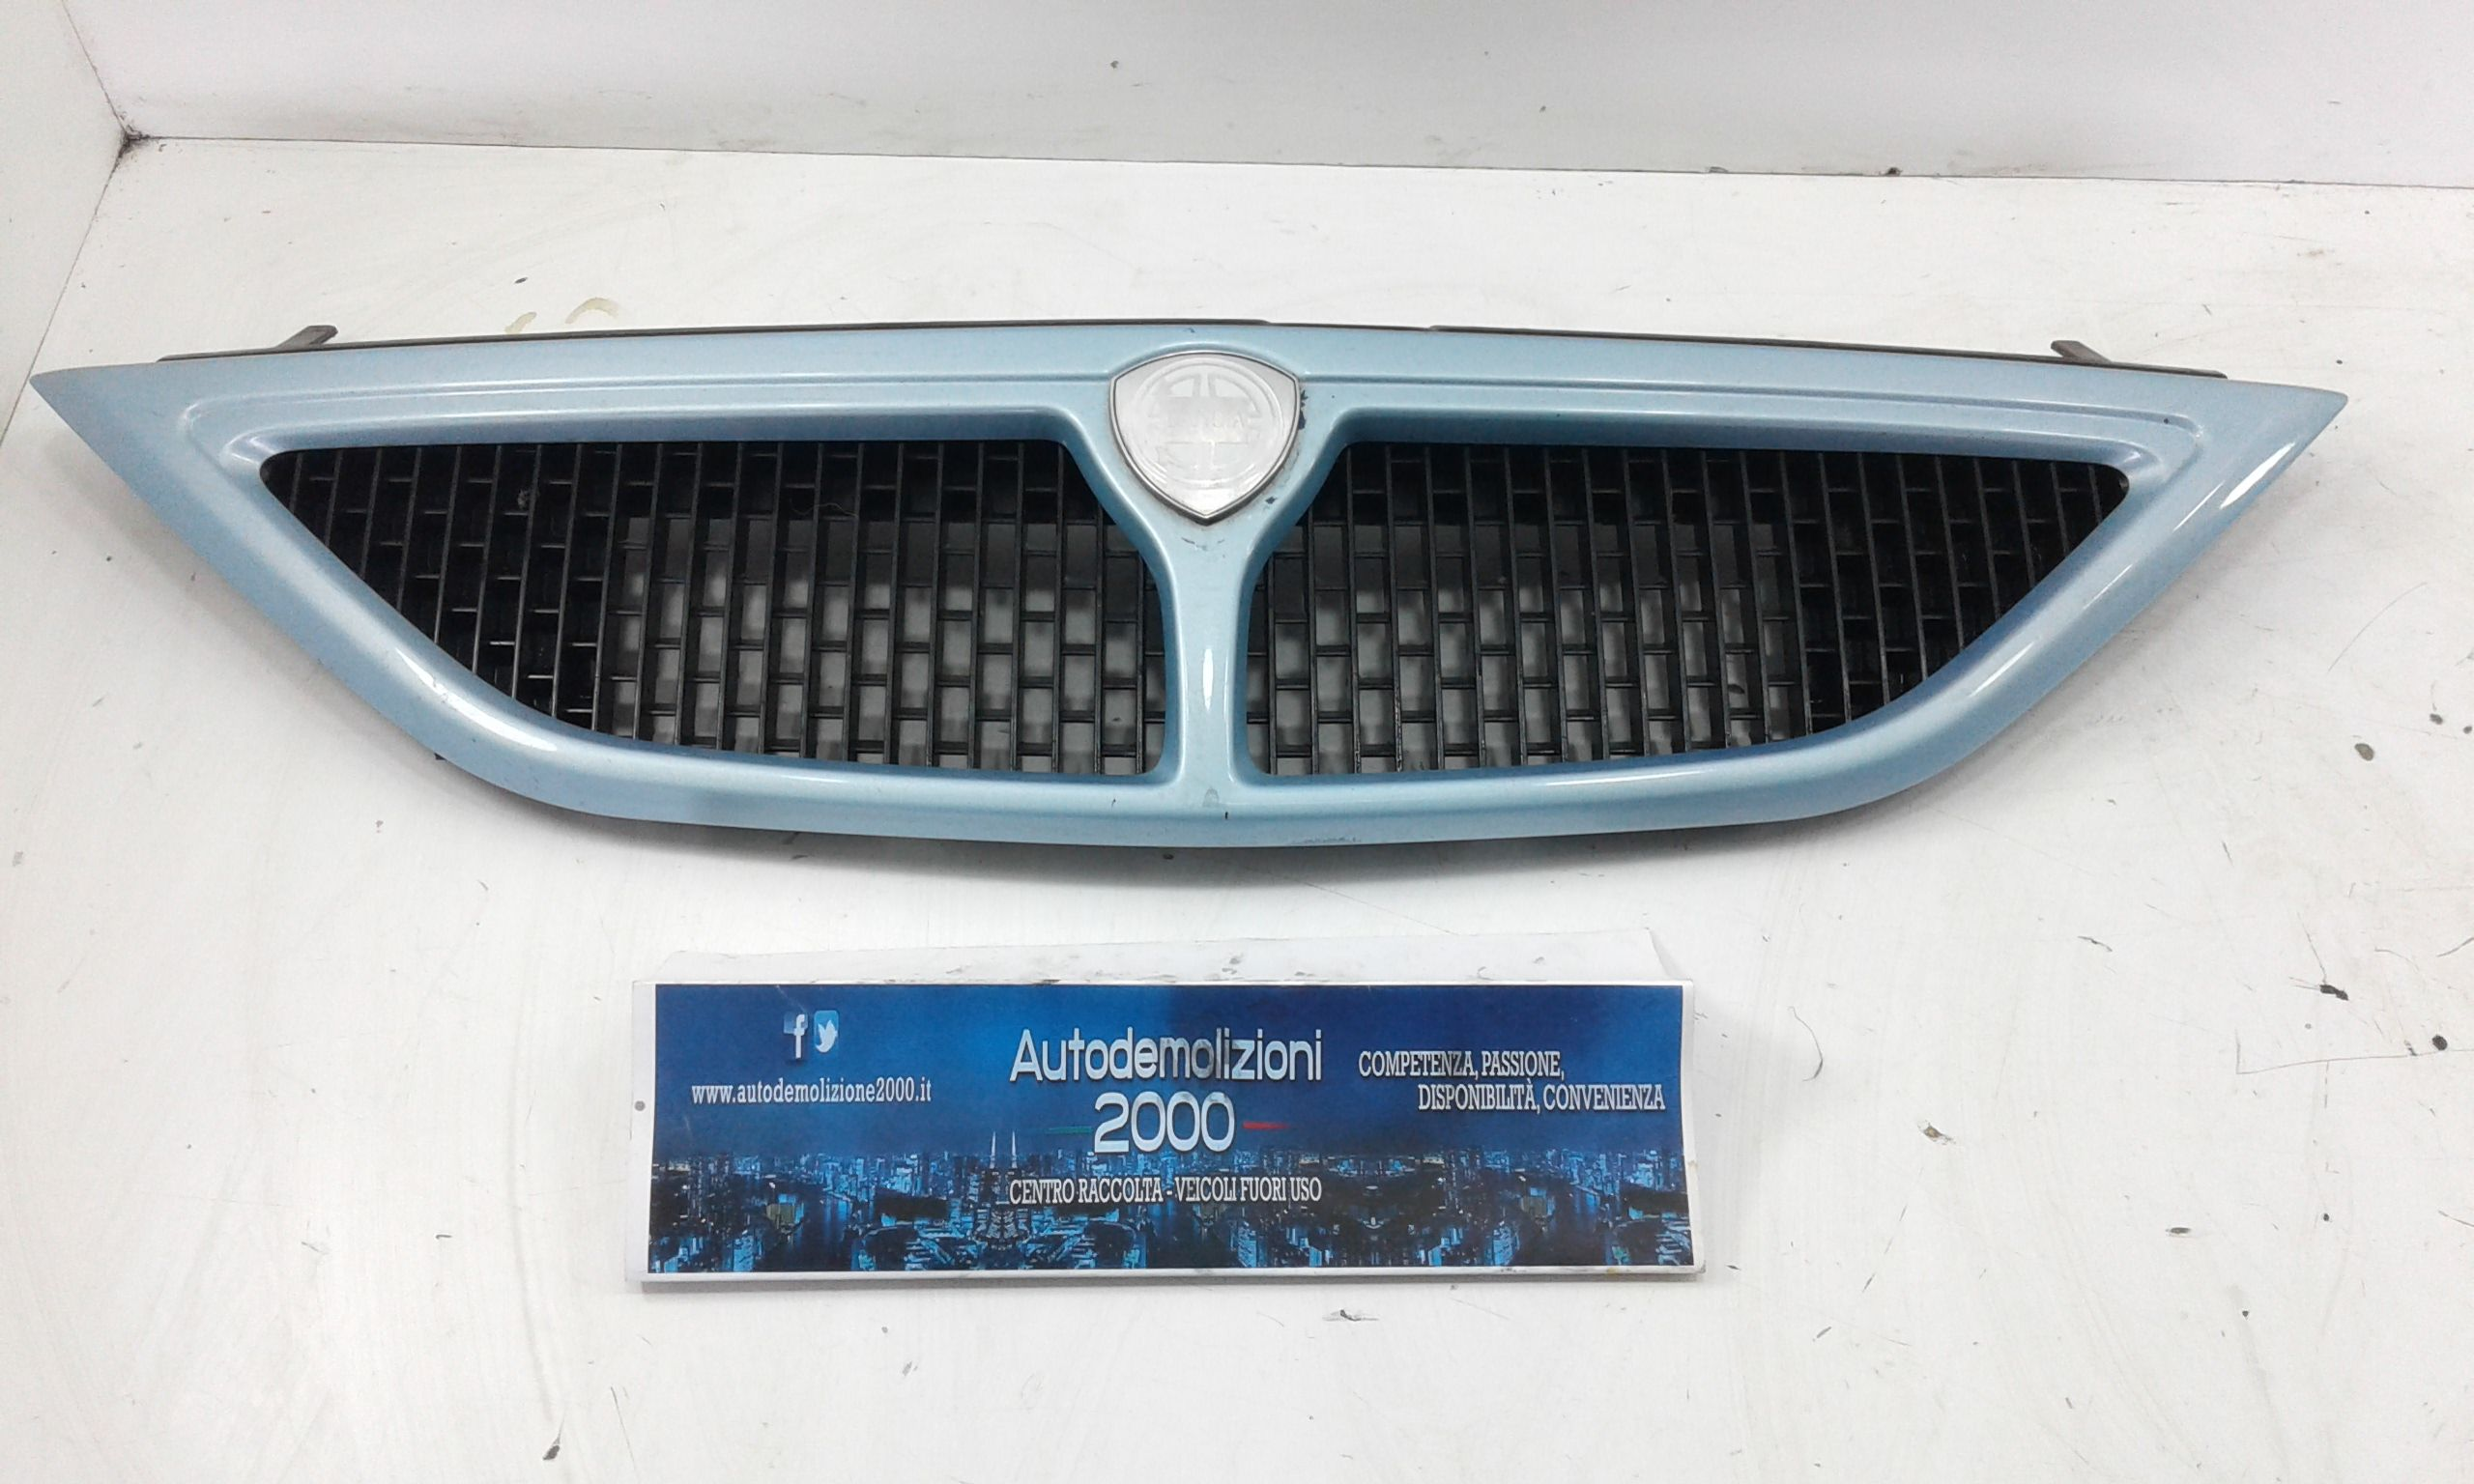 MASCHERINA ANTERIORE LANCIA Y Serie Benzina (2000) RICAMBI USATI